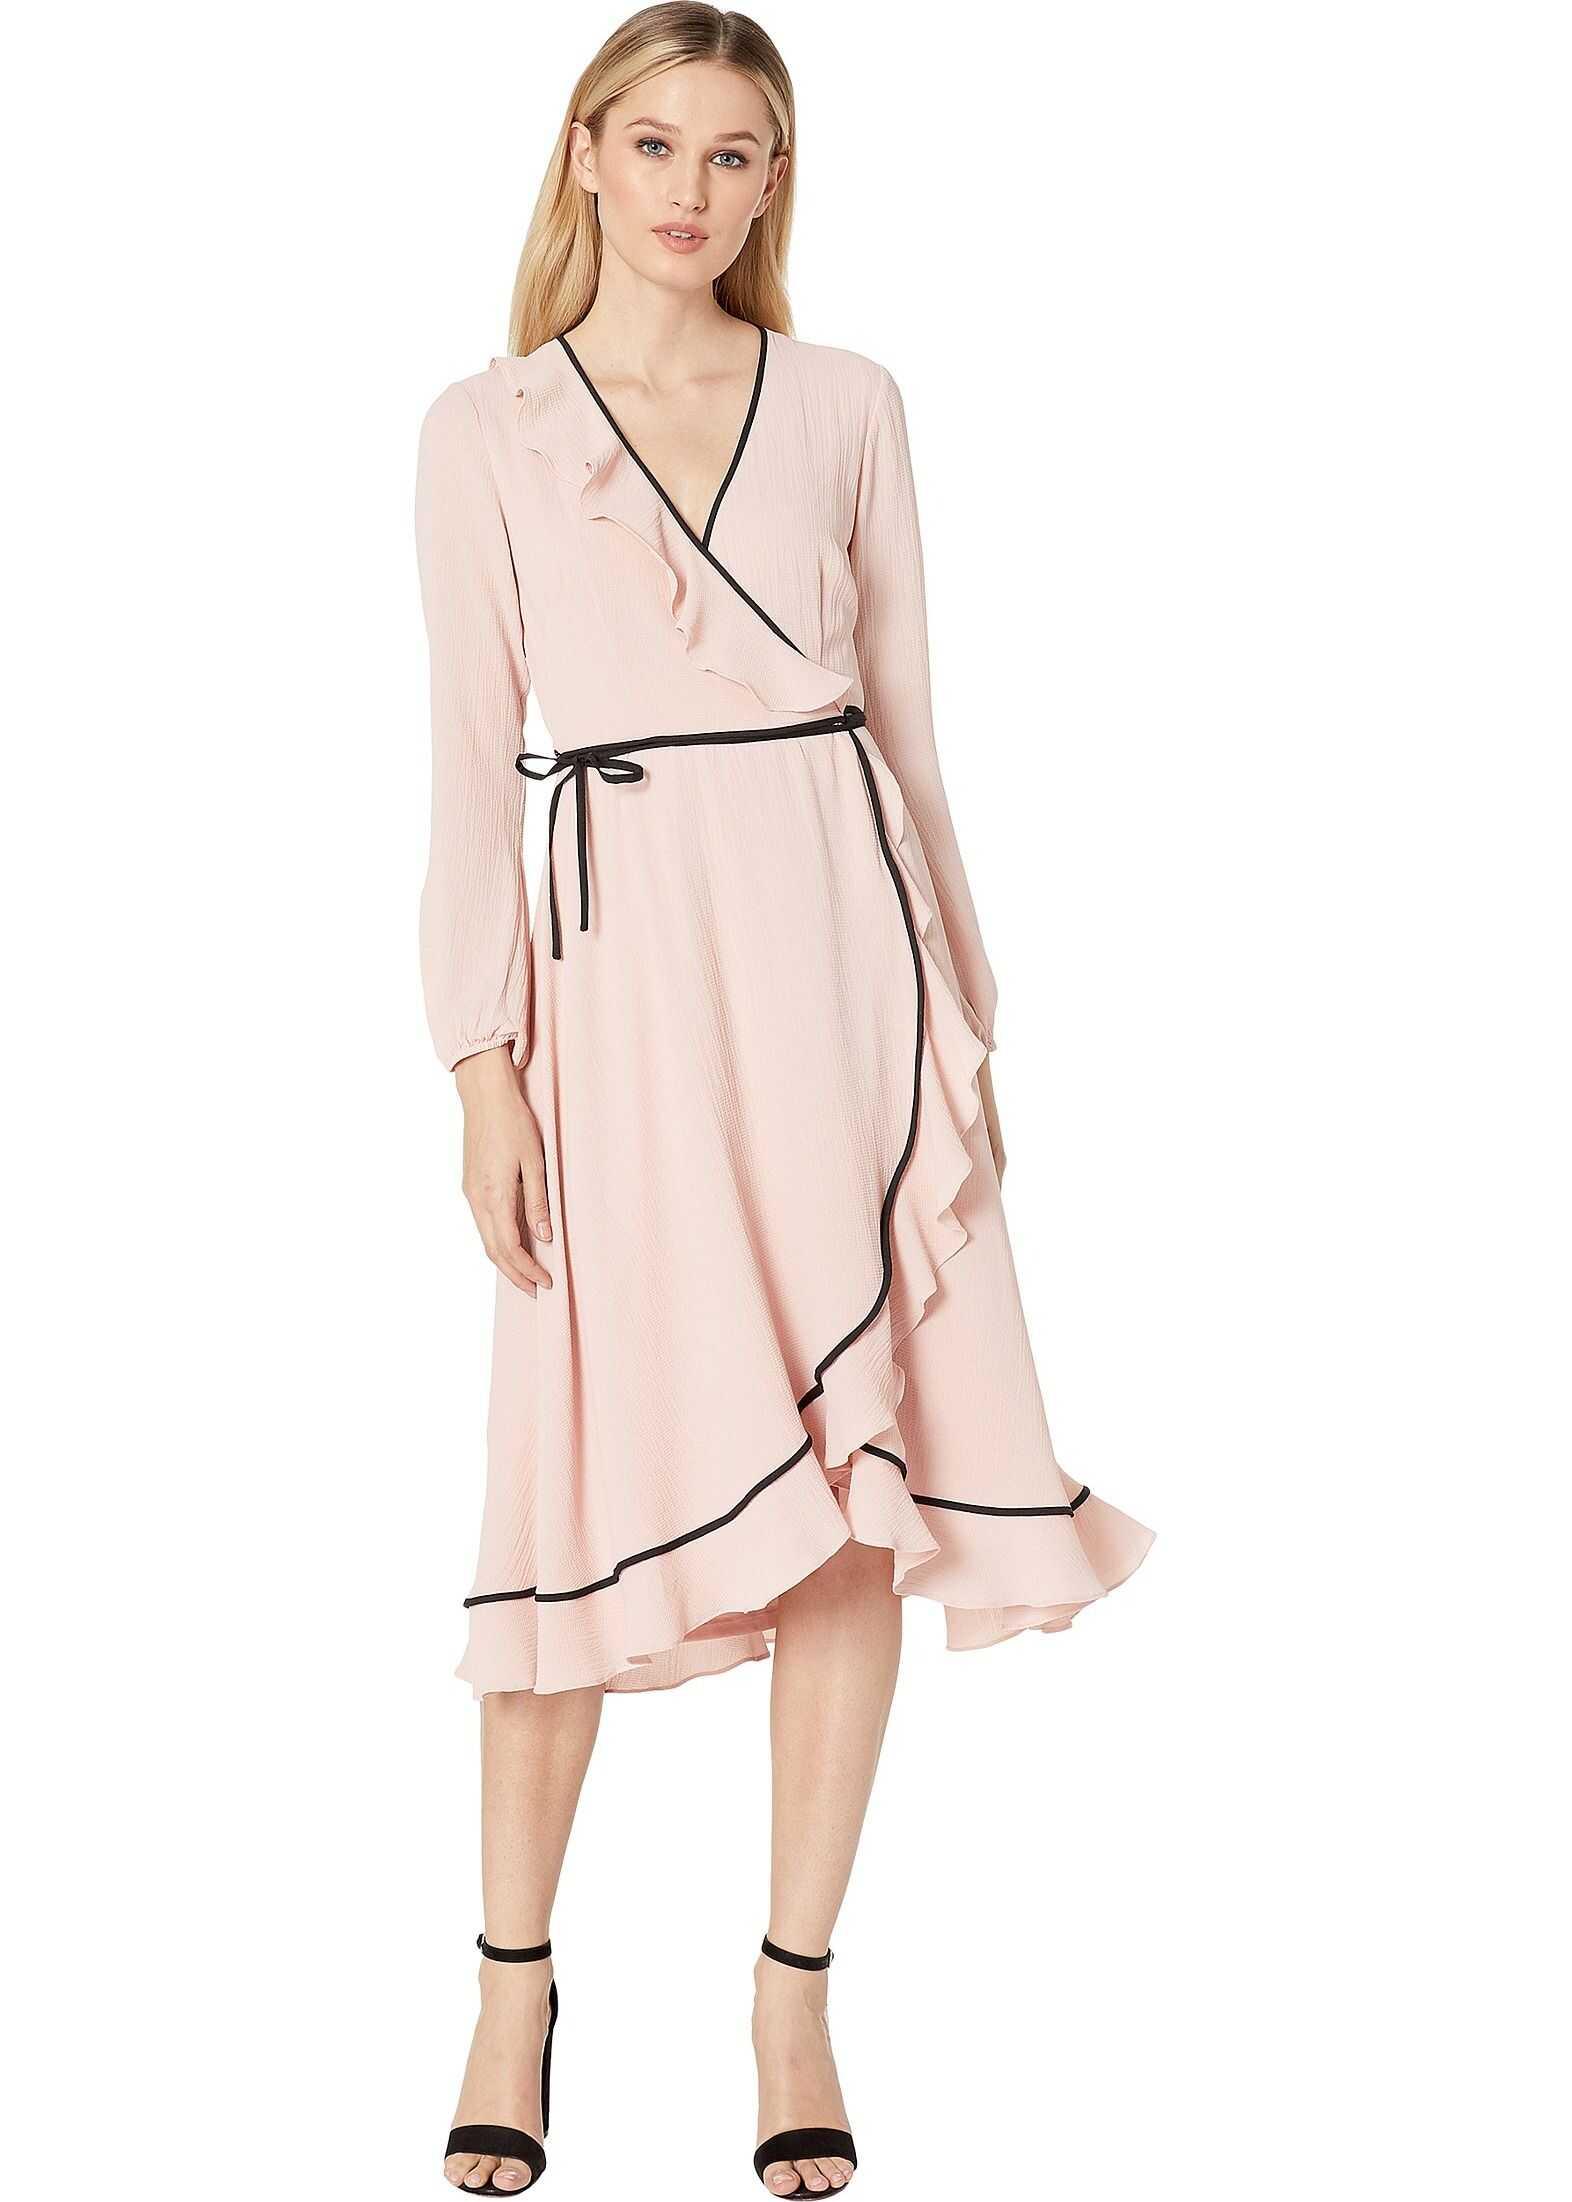 Adrianna Papell Pebble Chiffon Wrap Dress Lotus